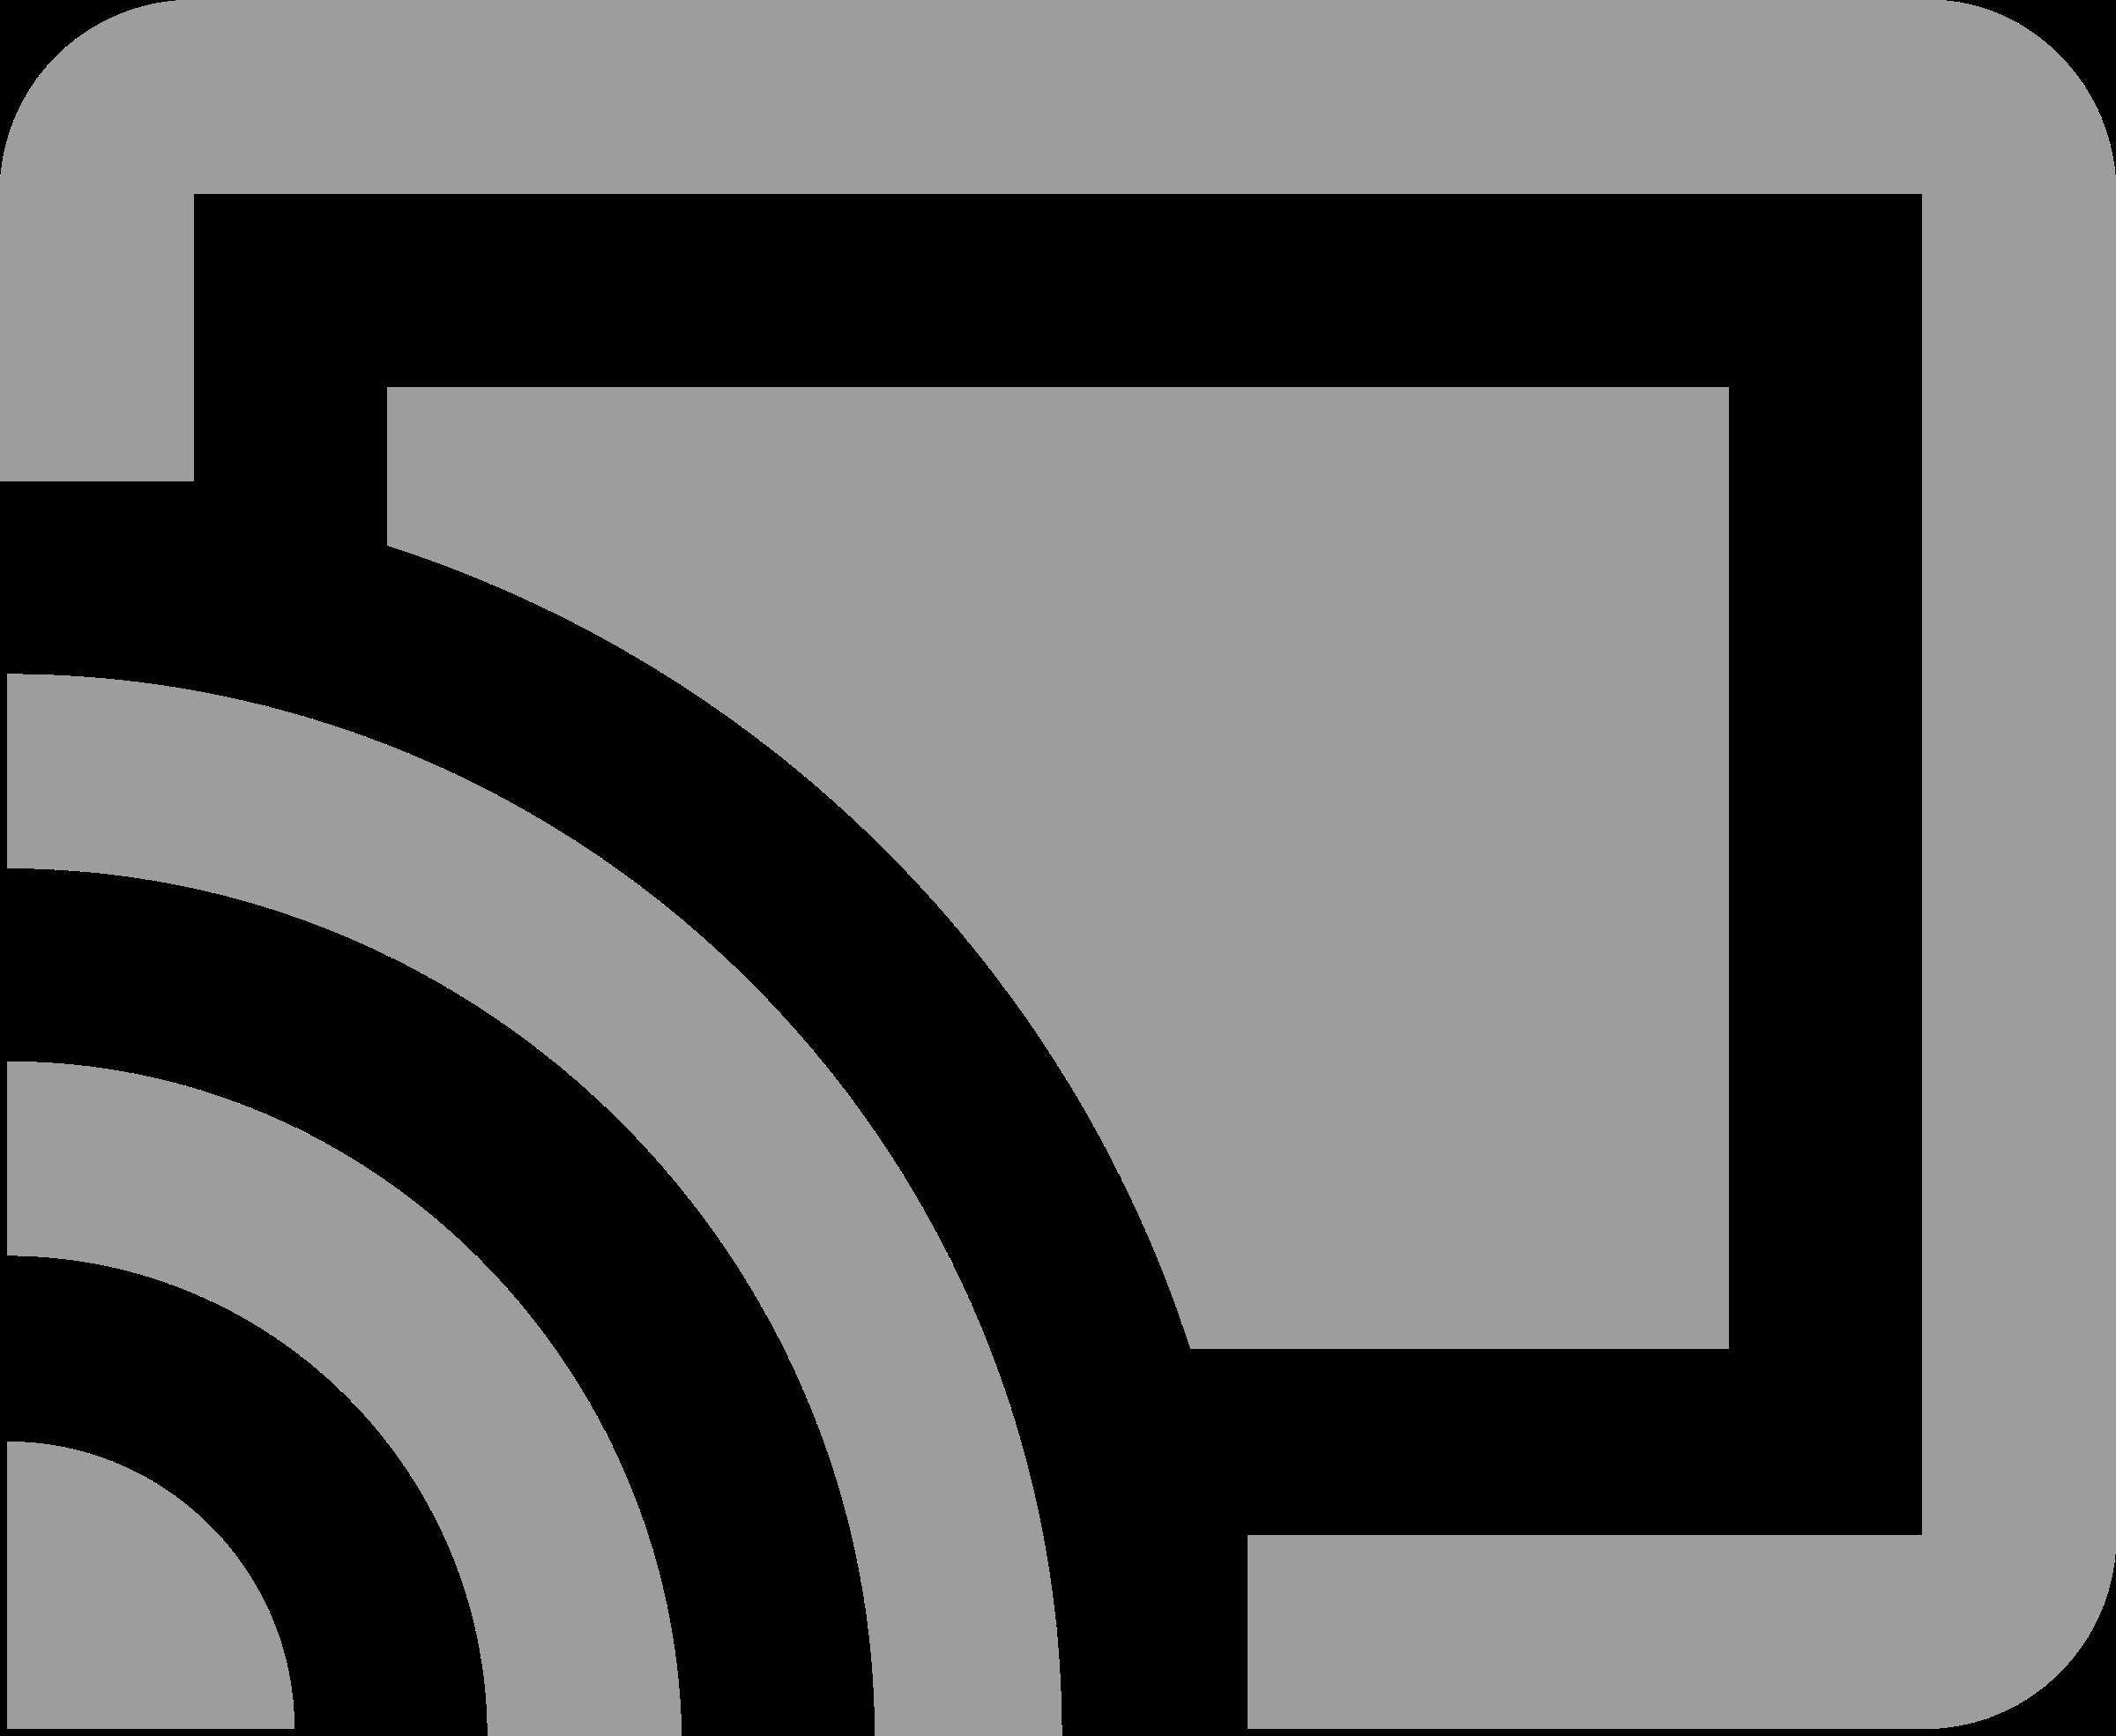 Cast icon Chromecast Logo PNG Transparent & SVG Vector.